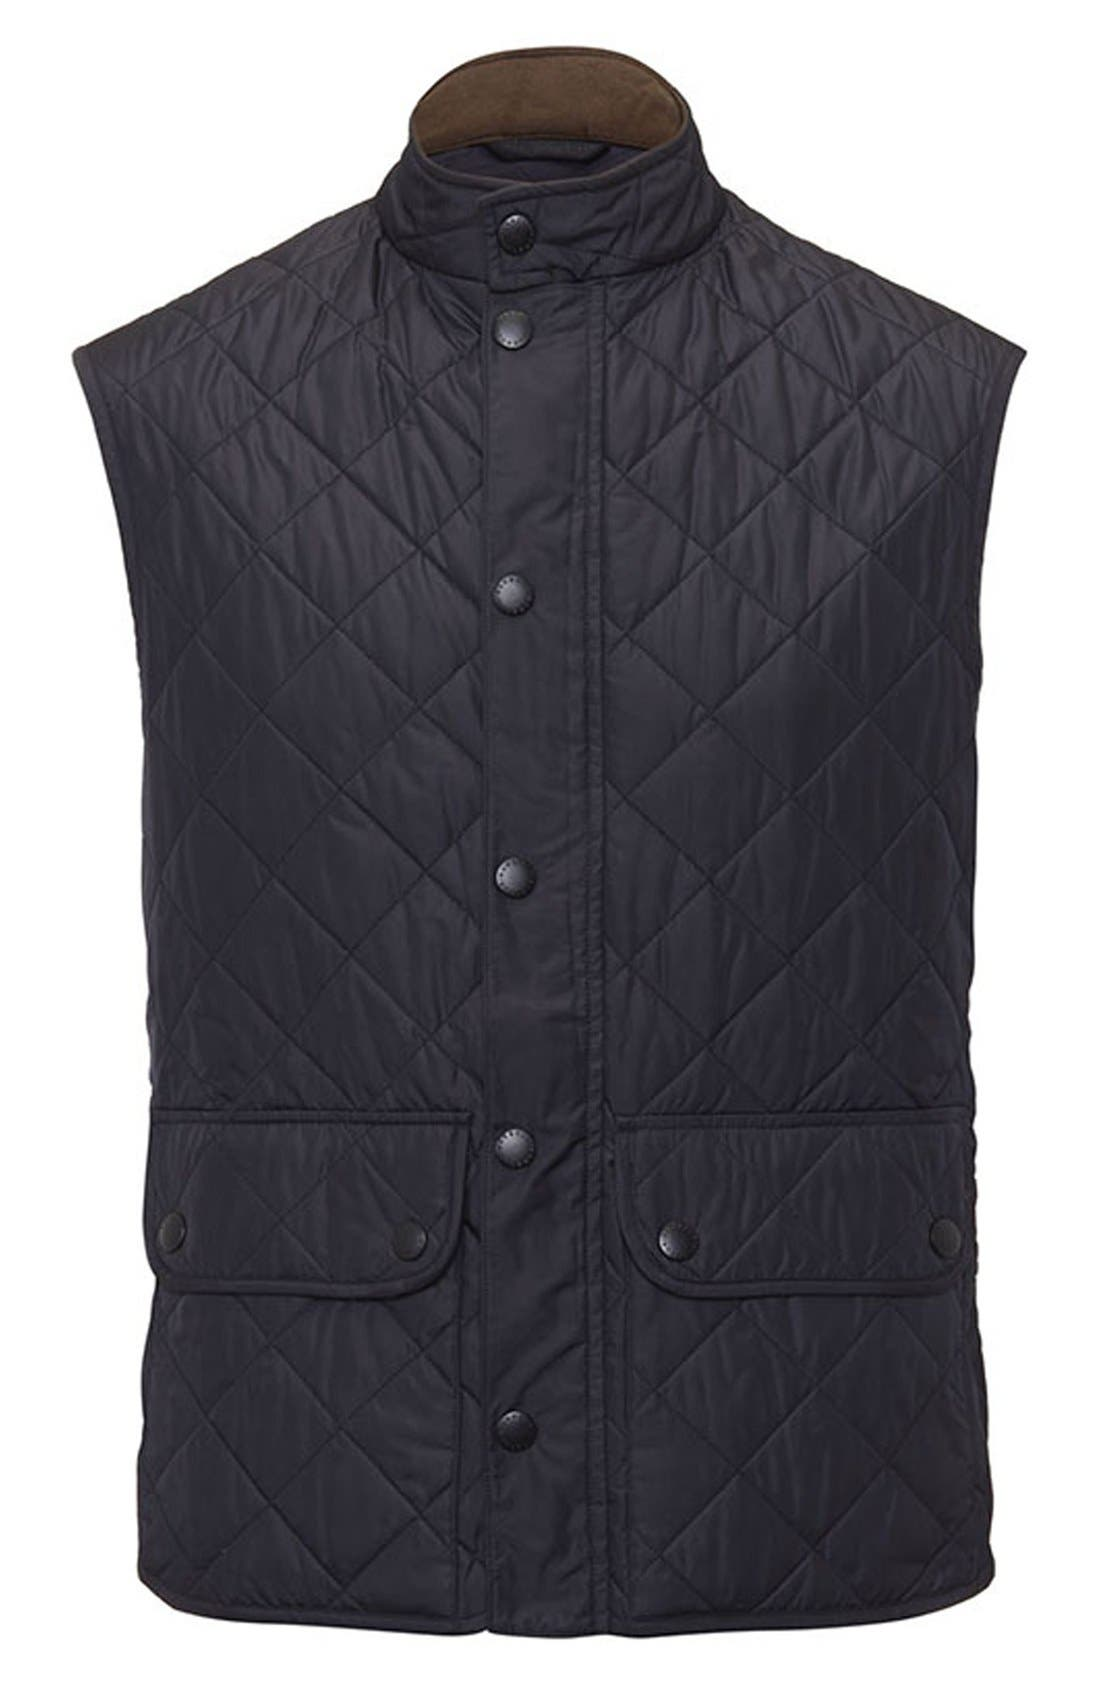 Alternate Image 4  - Barbour 'Lowerdale' Trim Fit Quilted Vest